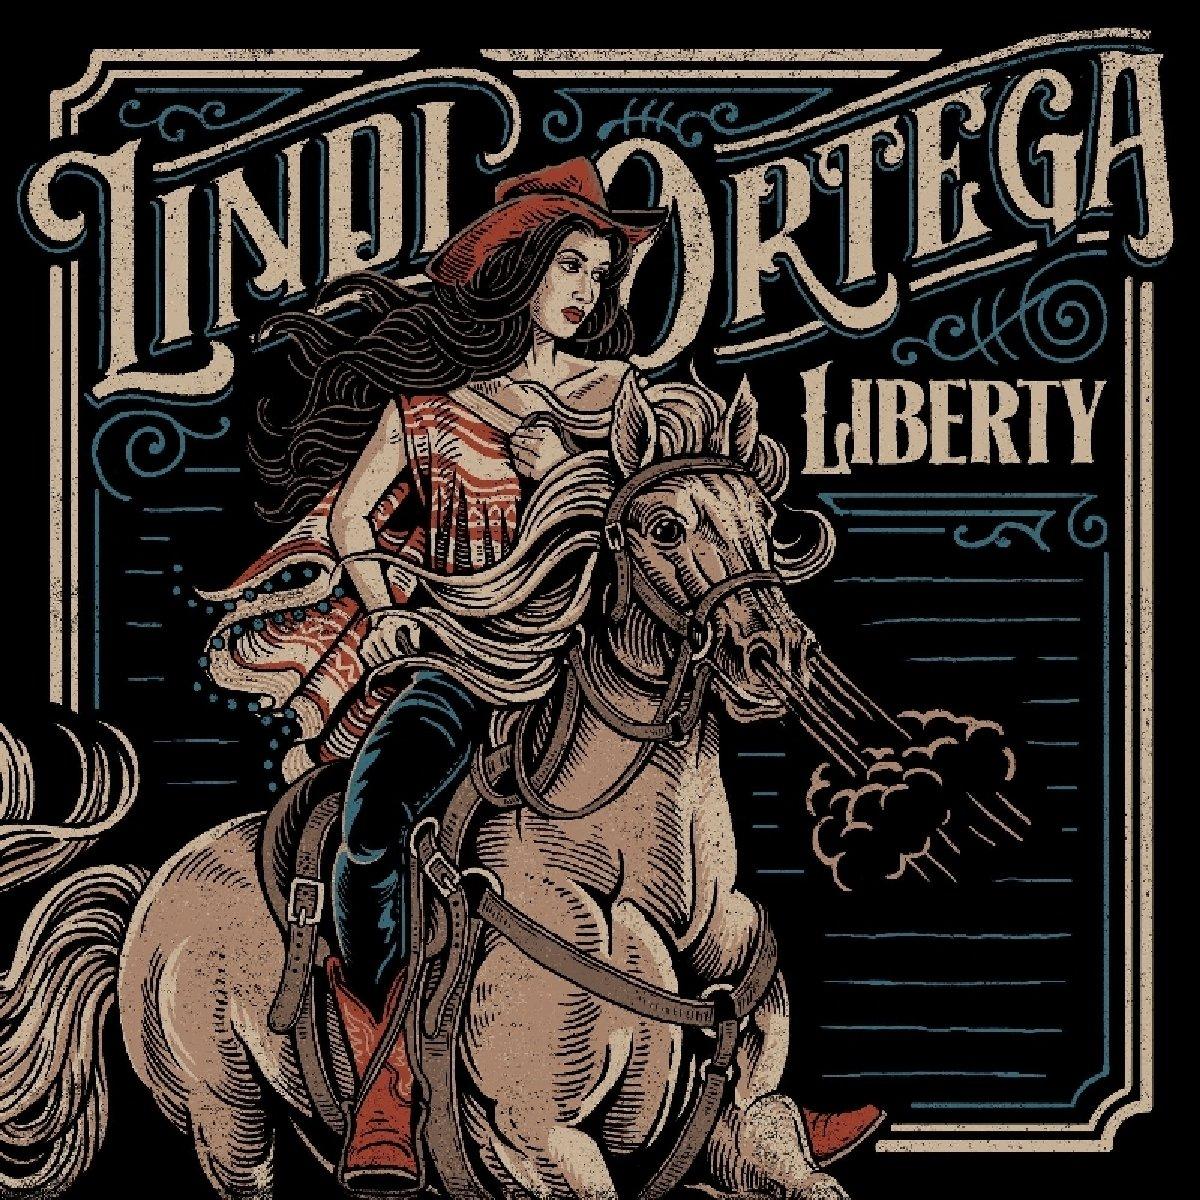 Vinilo : Lindi Ortega - Liberty (LP Vinyl)